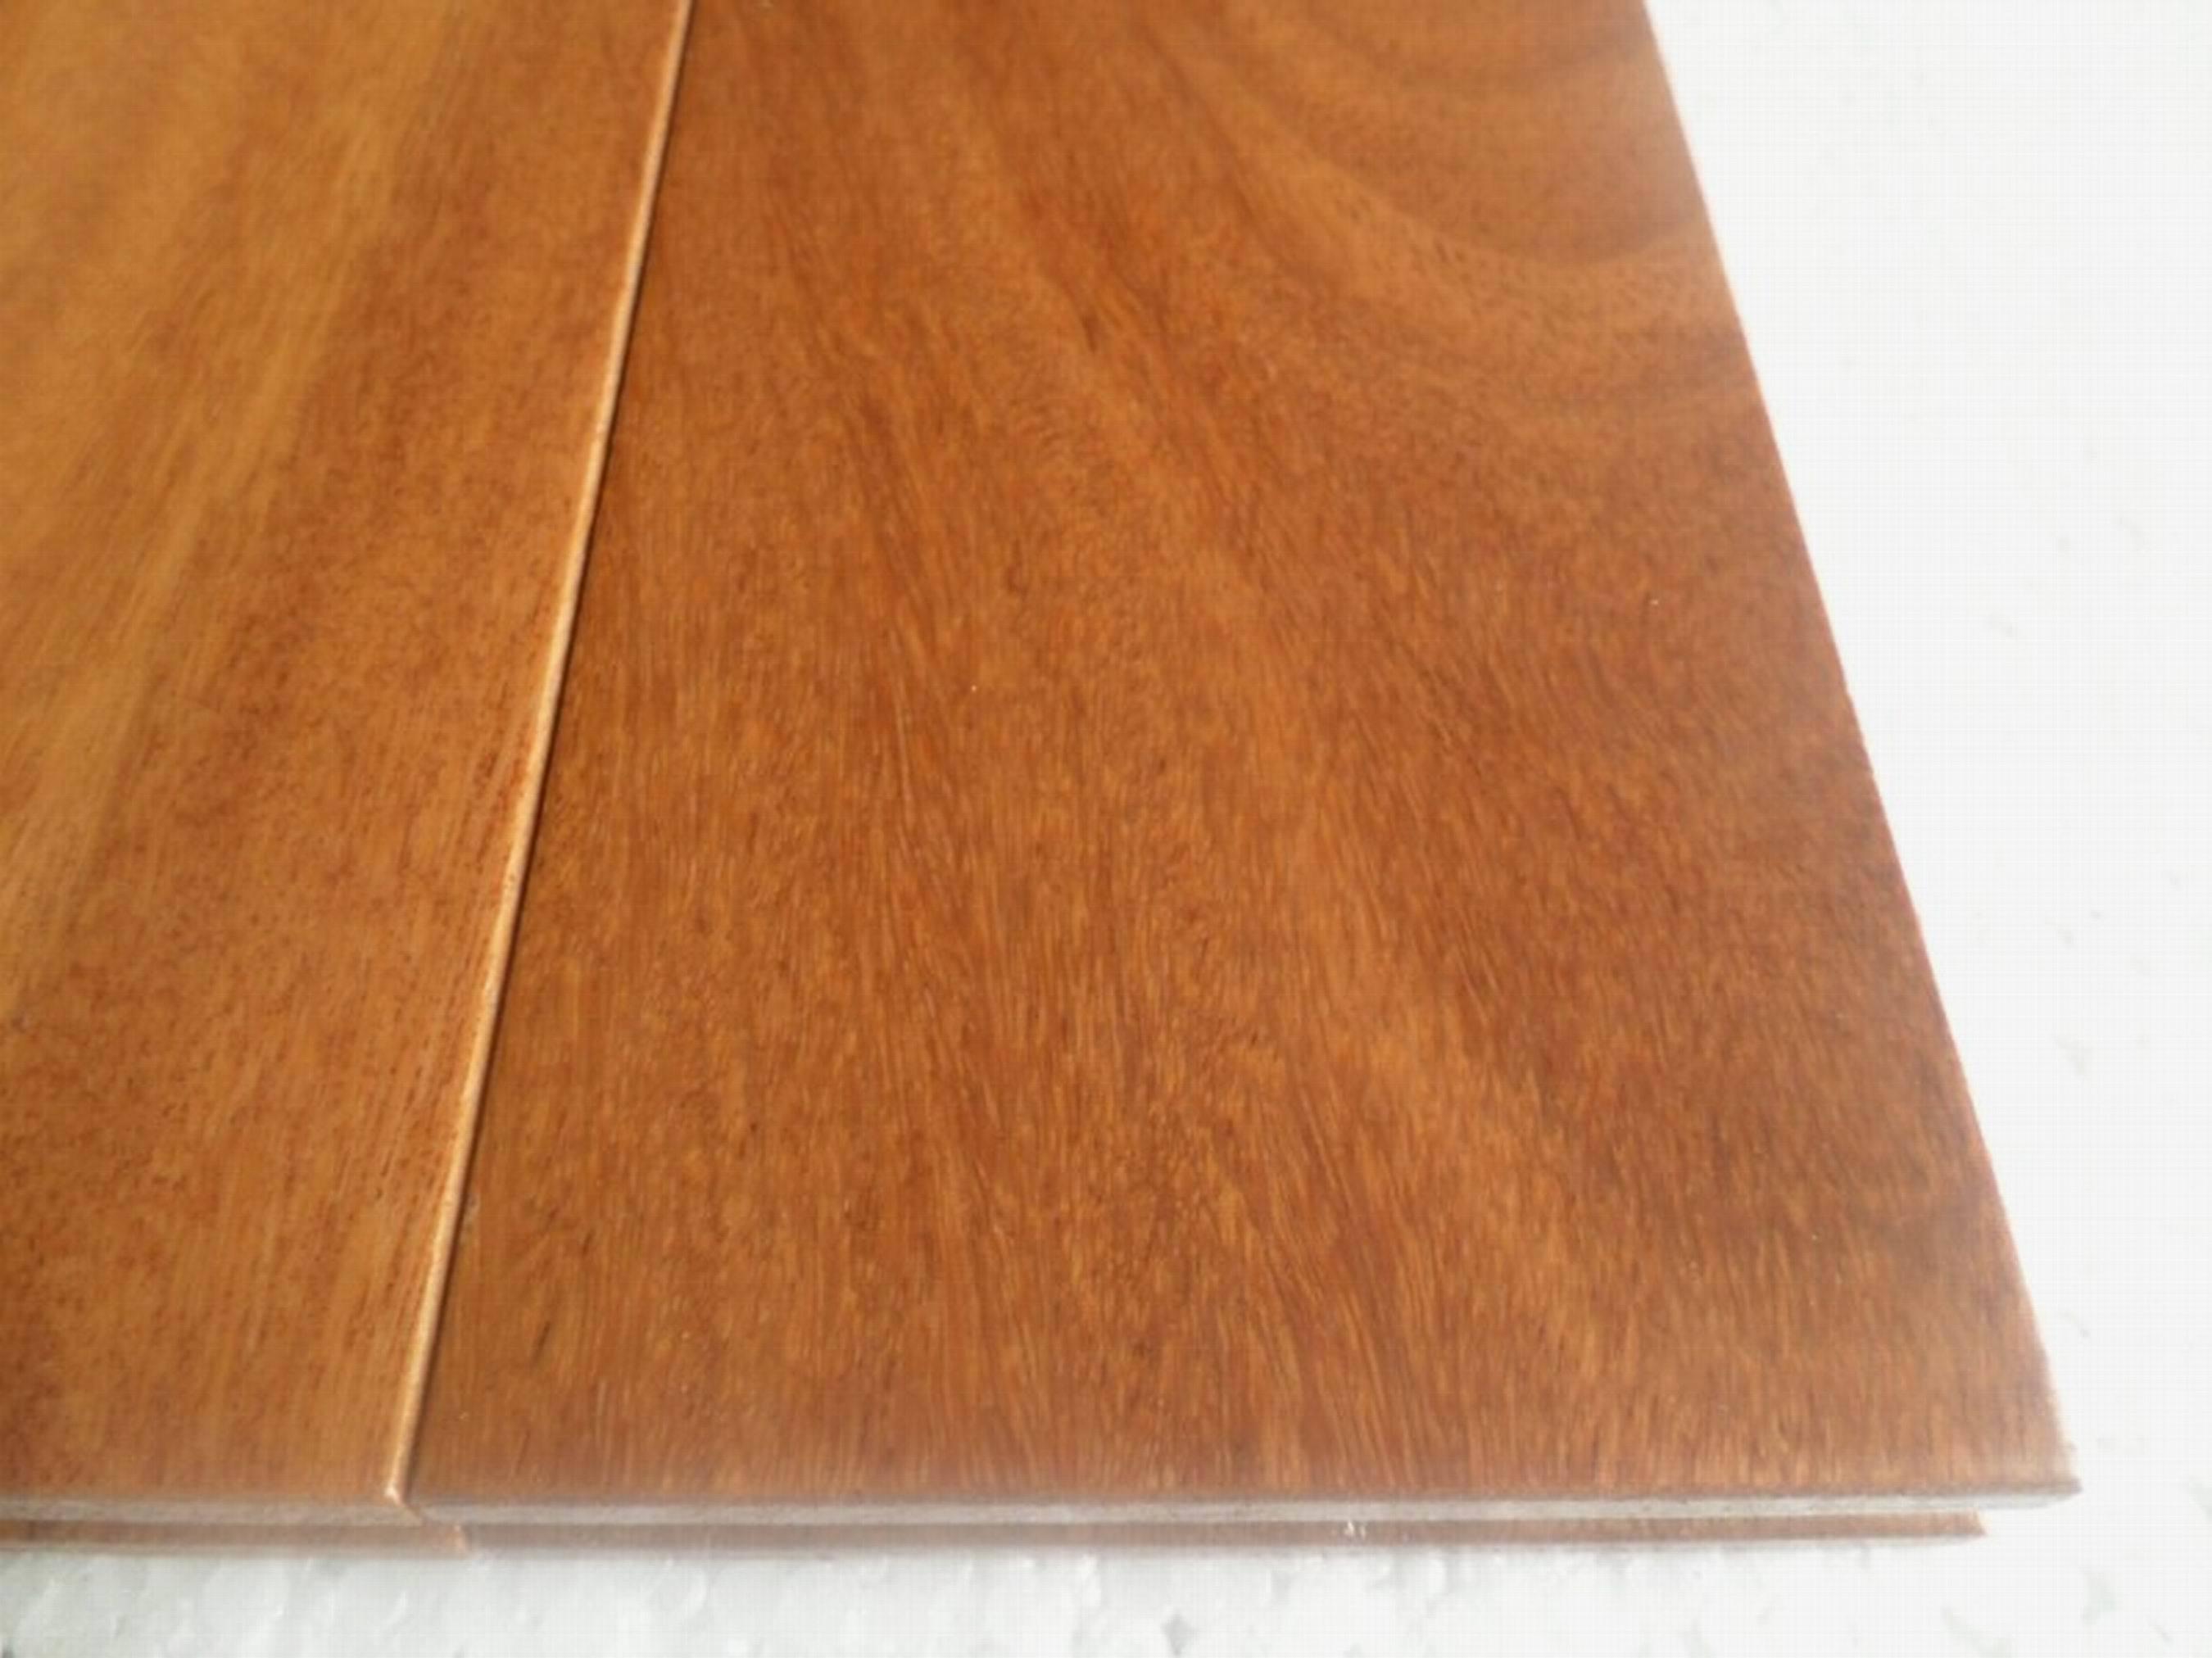 China Foshan Hotsale Brazilian Teak Parquet Wood Flooring